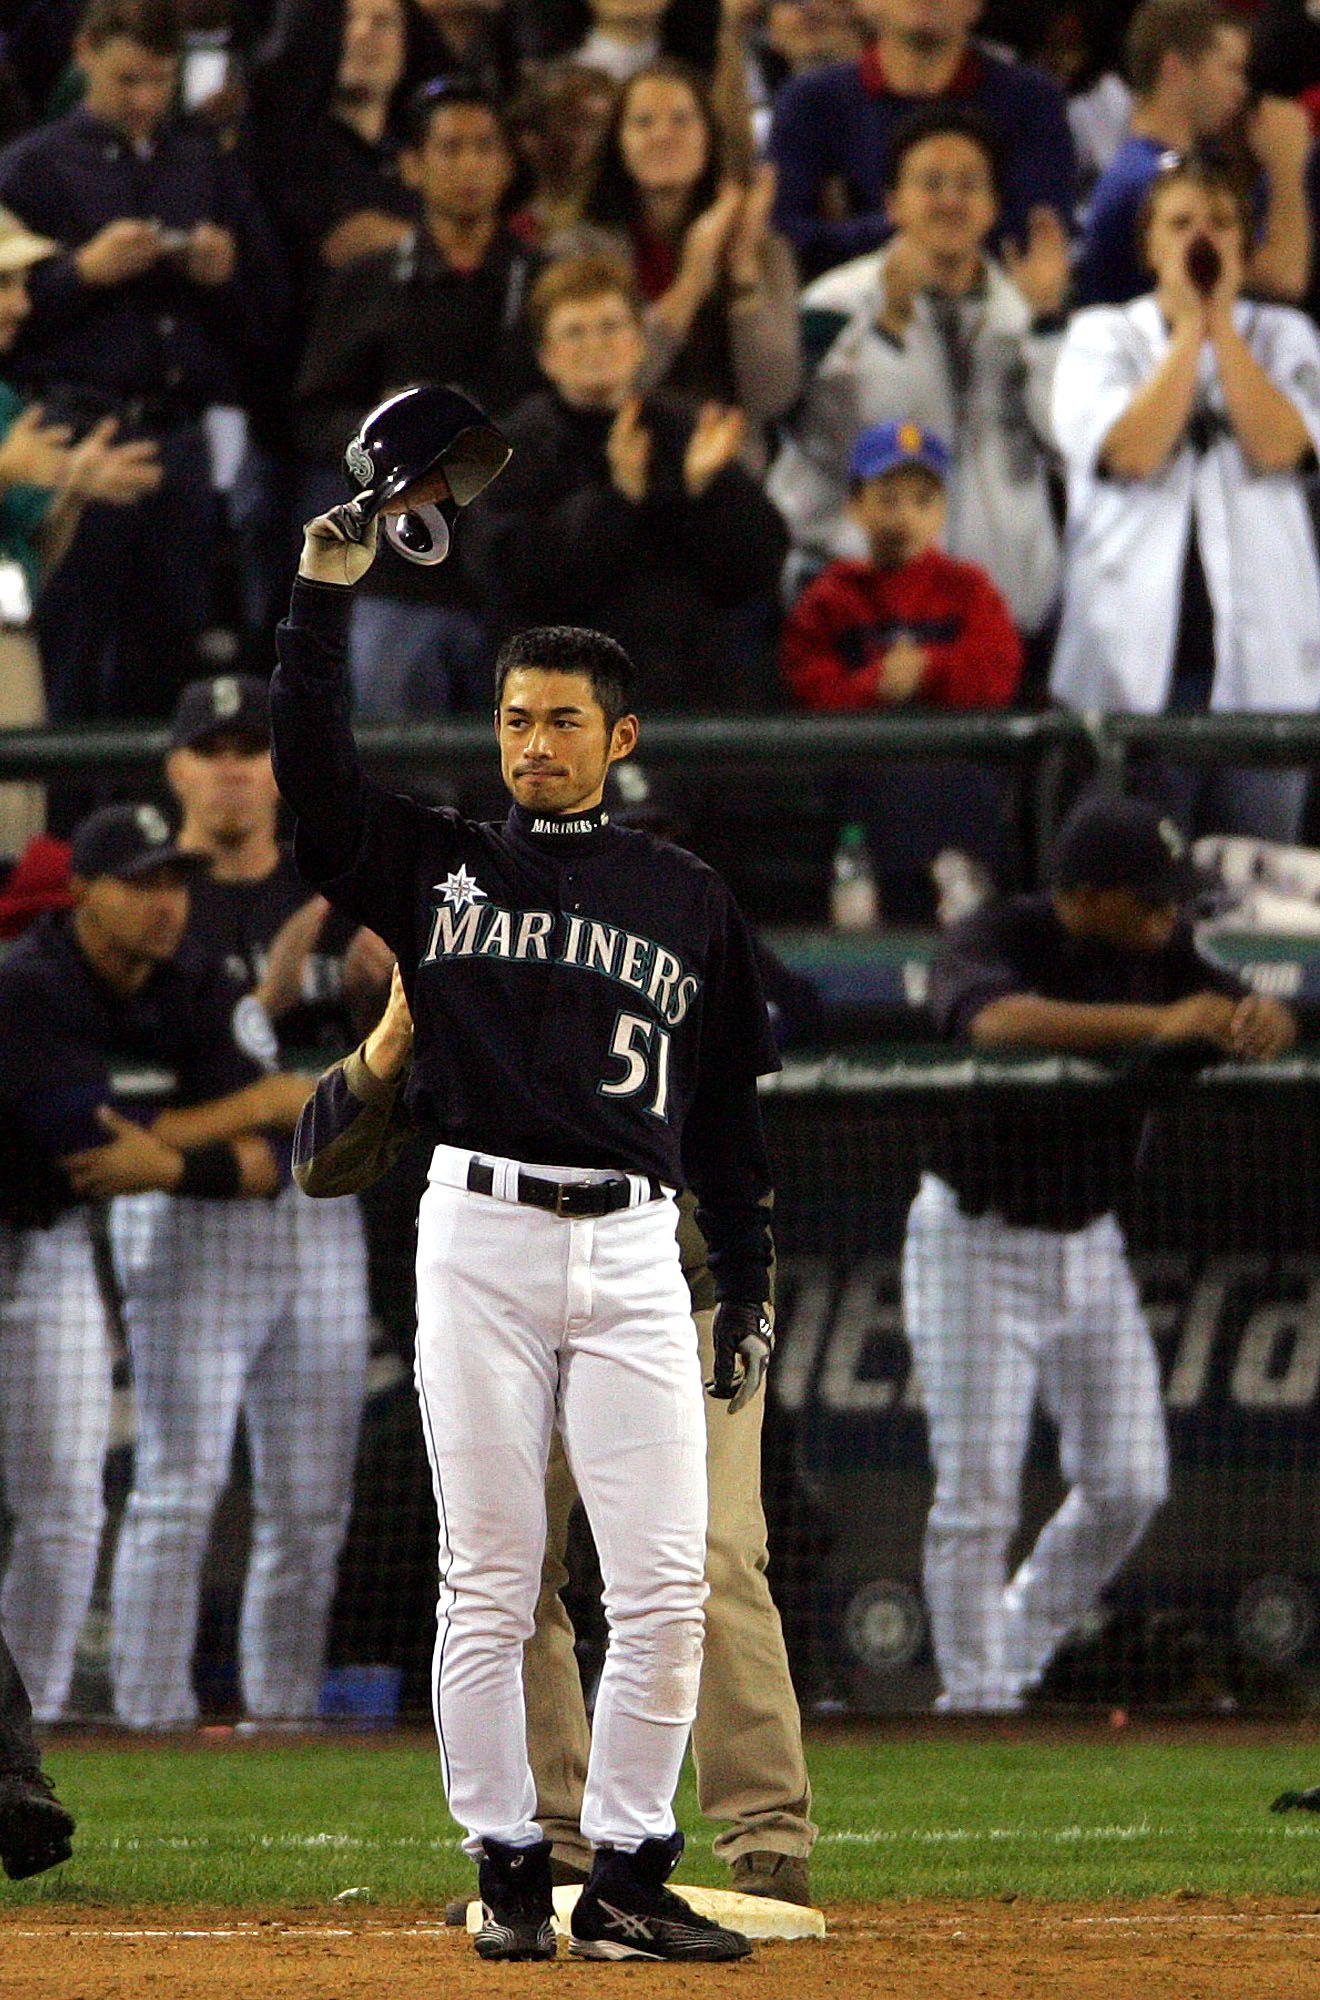 Ichiro Suzuki Stats Video Highlights Photos Bio Ichiro Suzuki Mariners Baseball Best Baseball Player